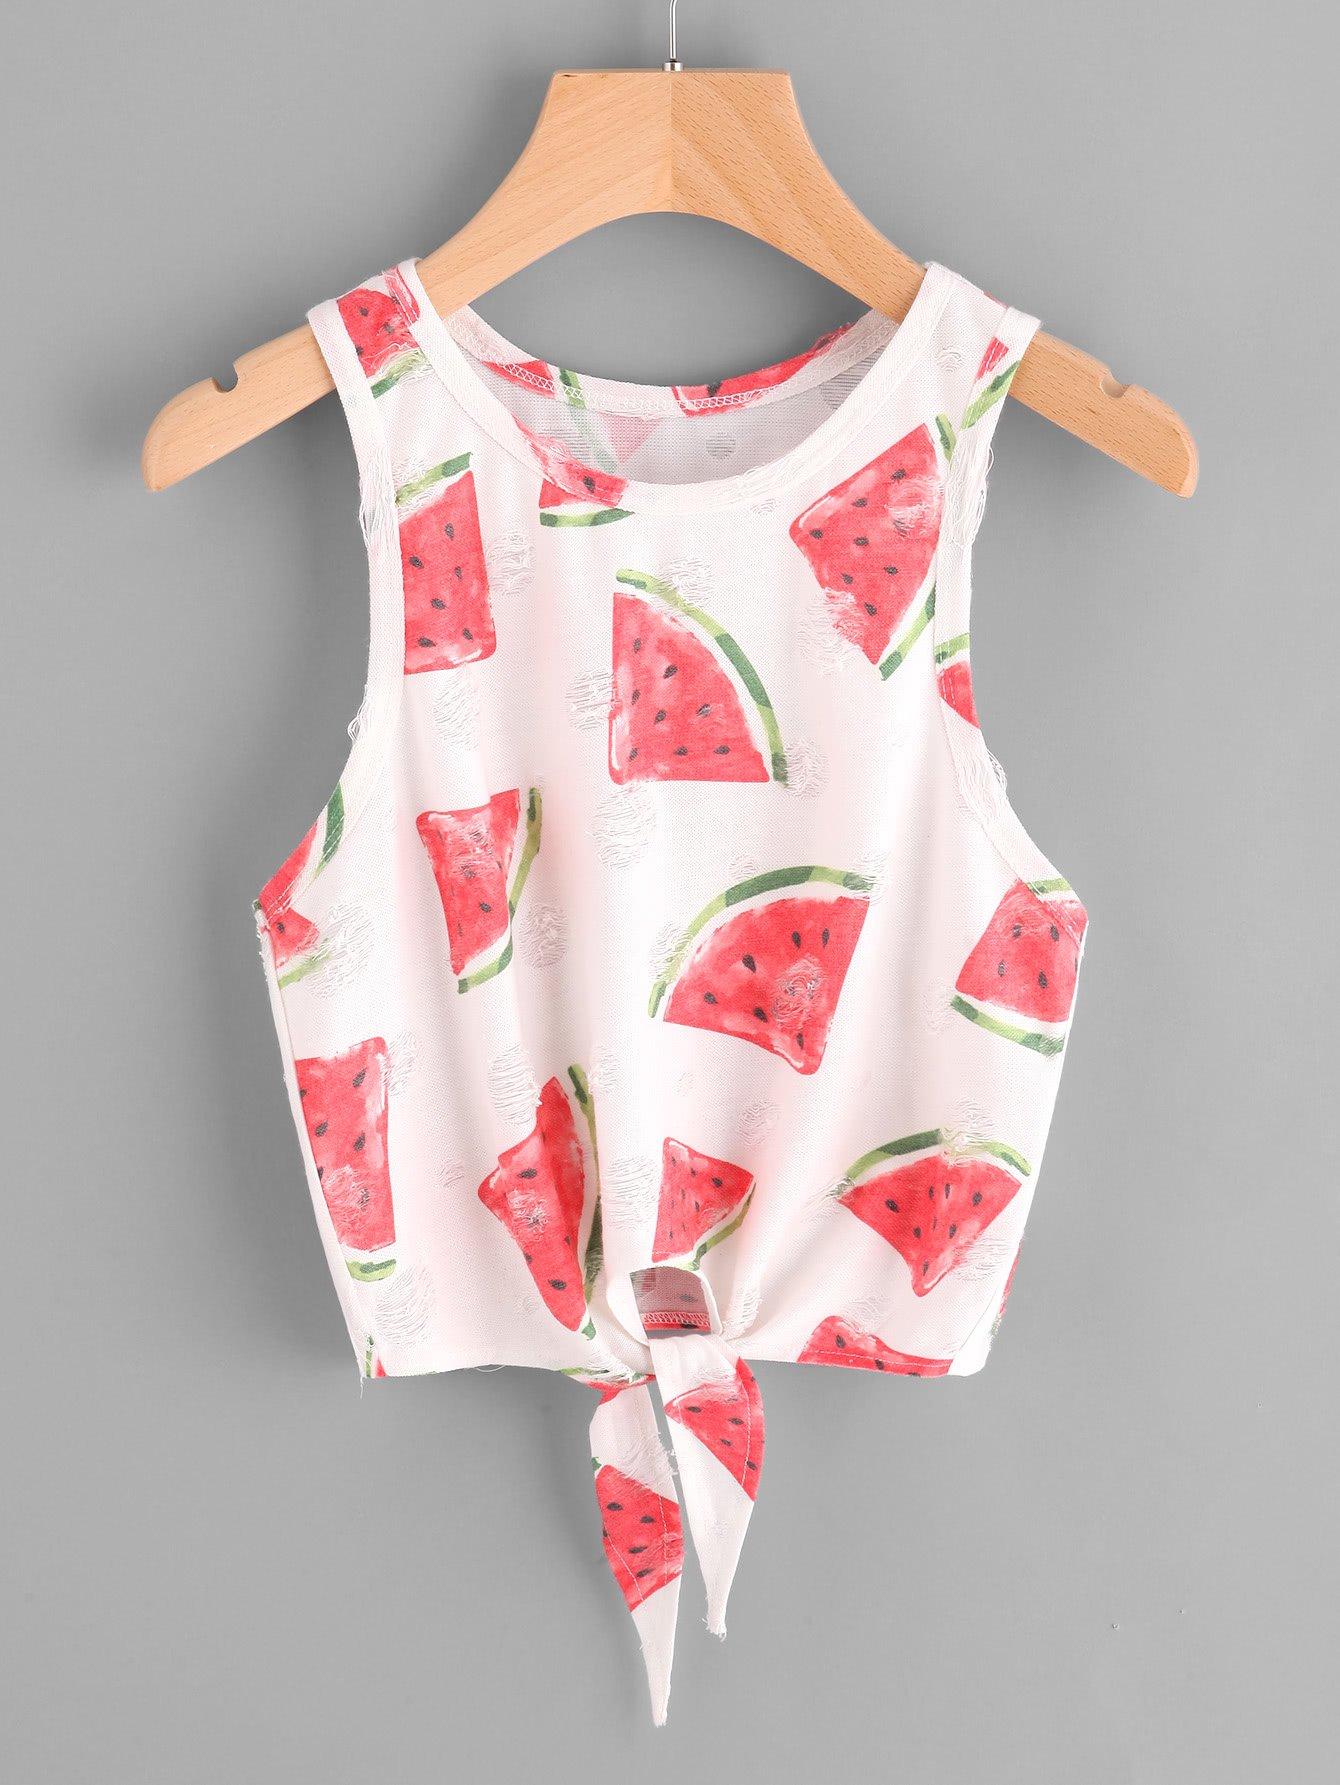 Watermelon Print Knot Front Frayed Dot Tank Top